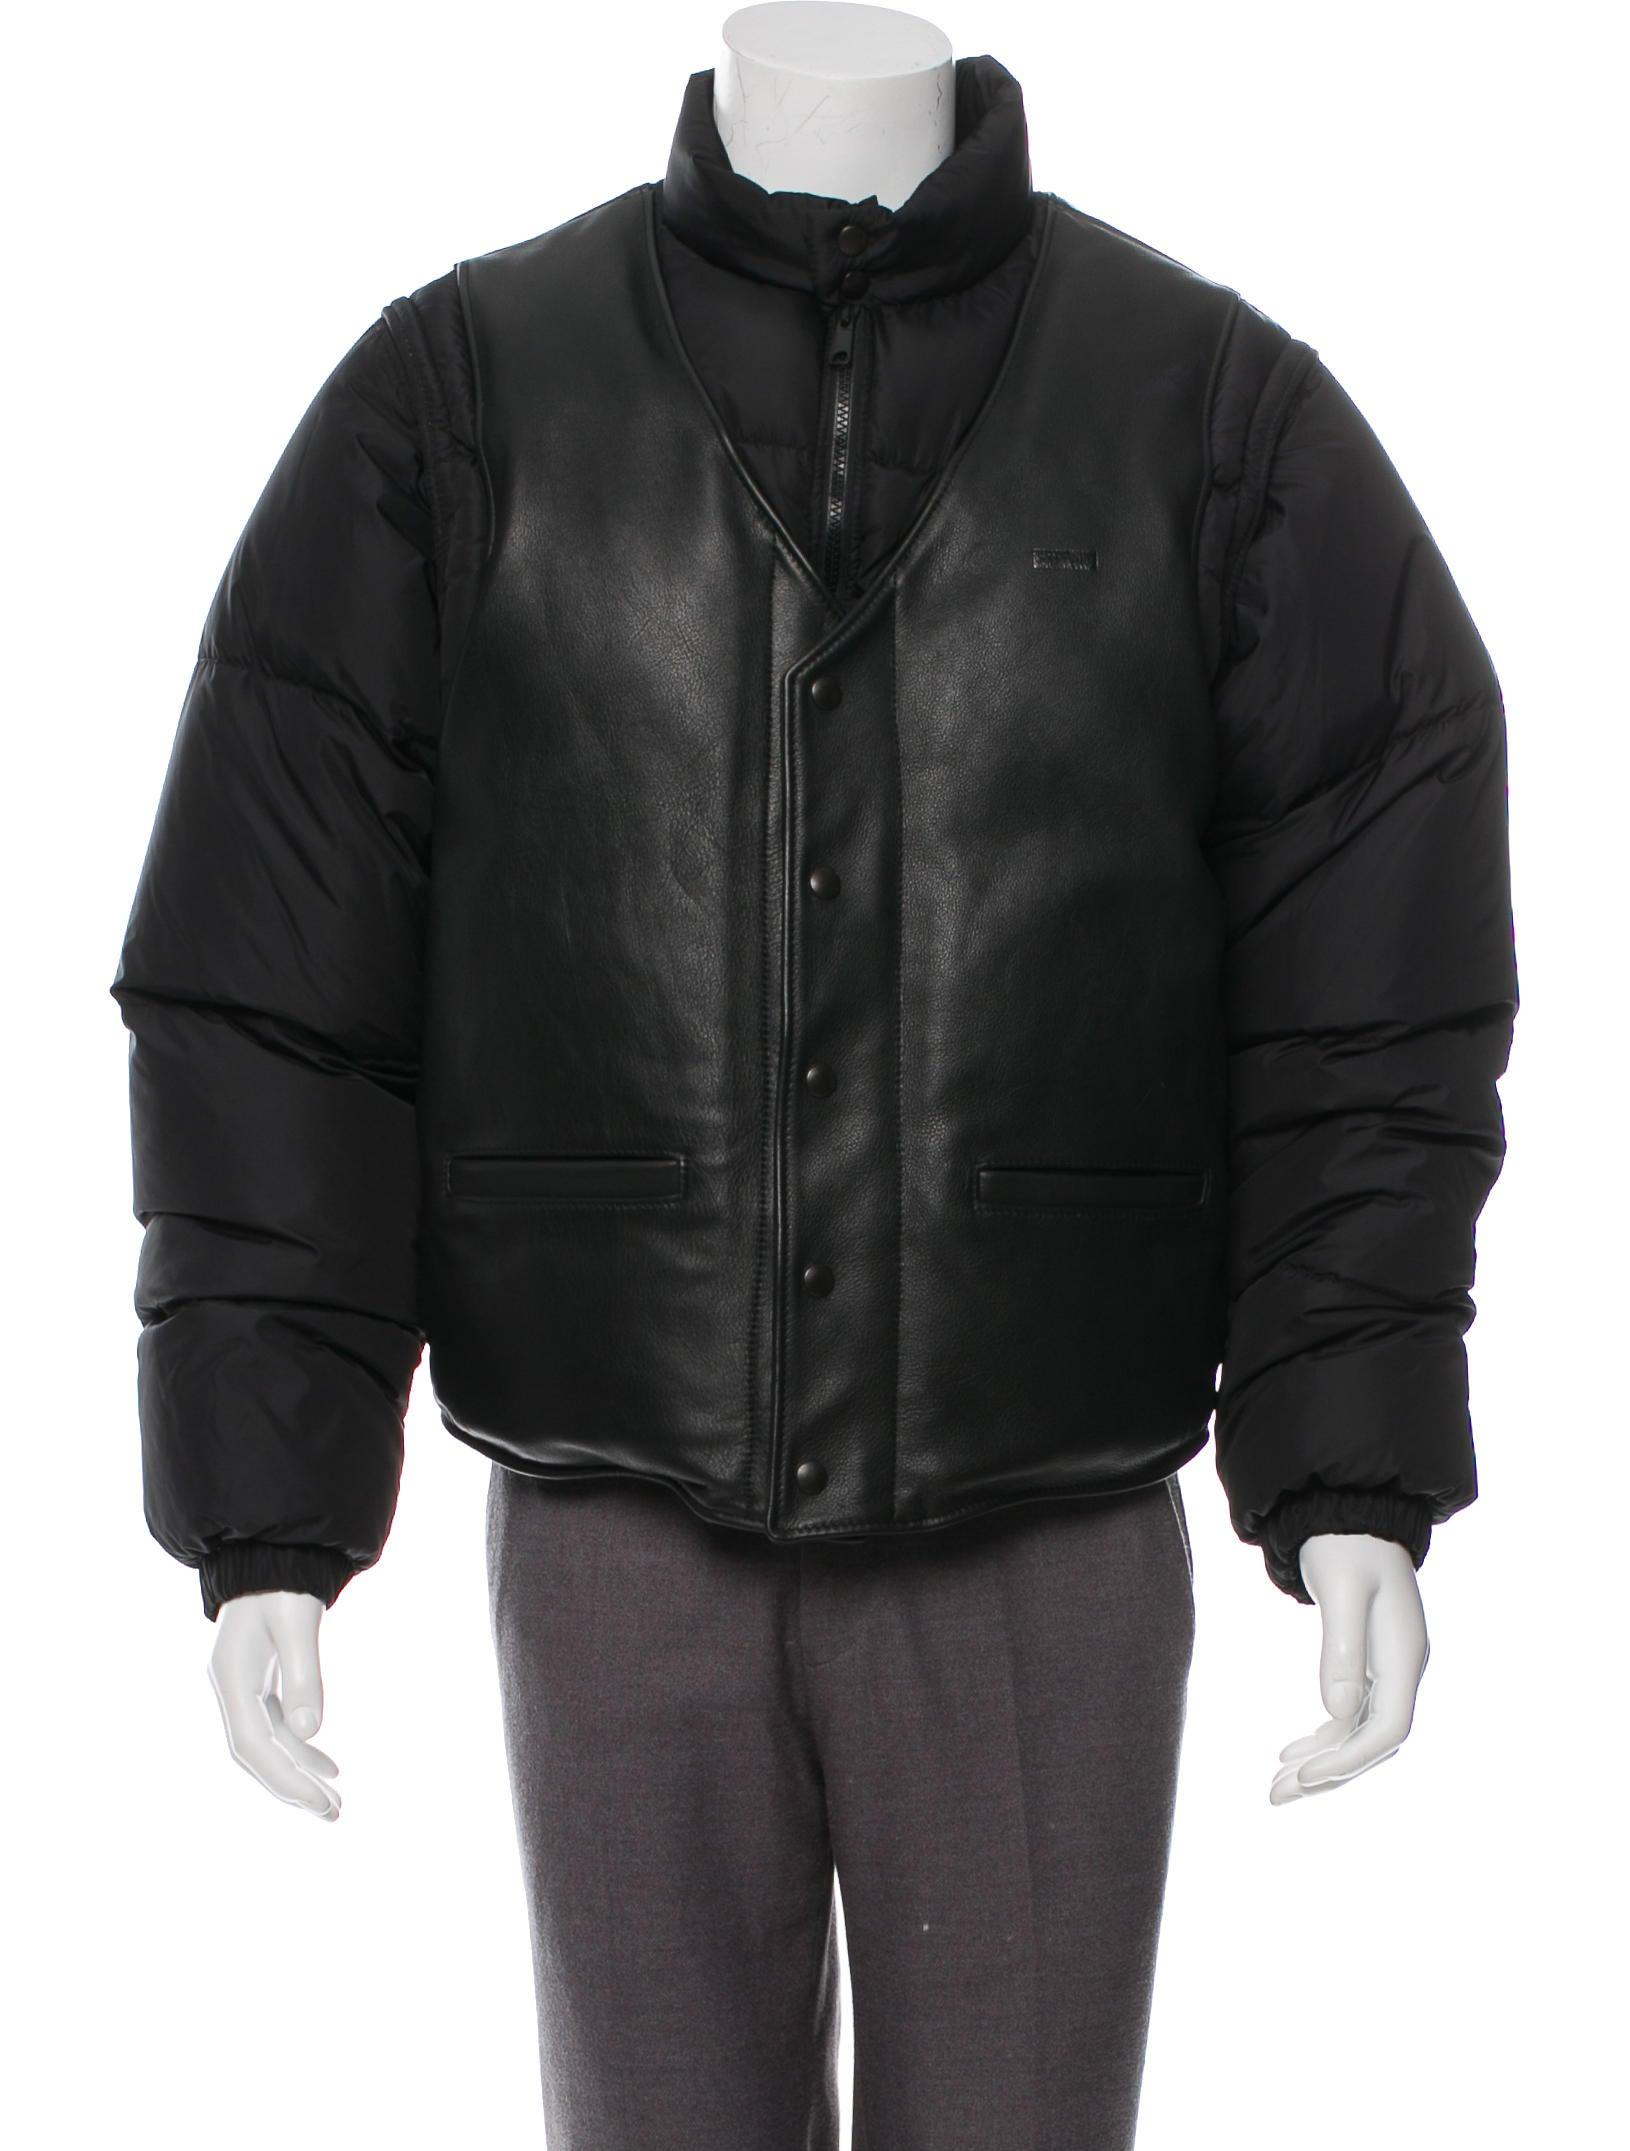 Supreme x Schott NYC 2018 Leather Vest Puffy Jacket